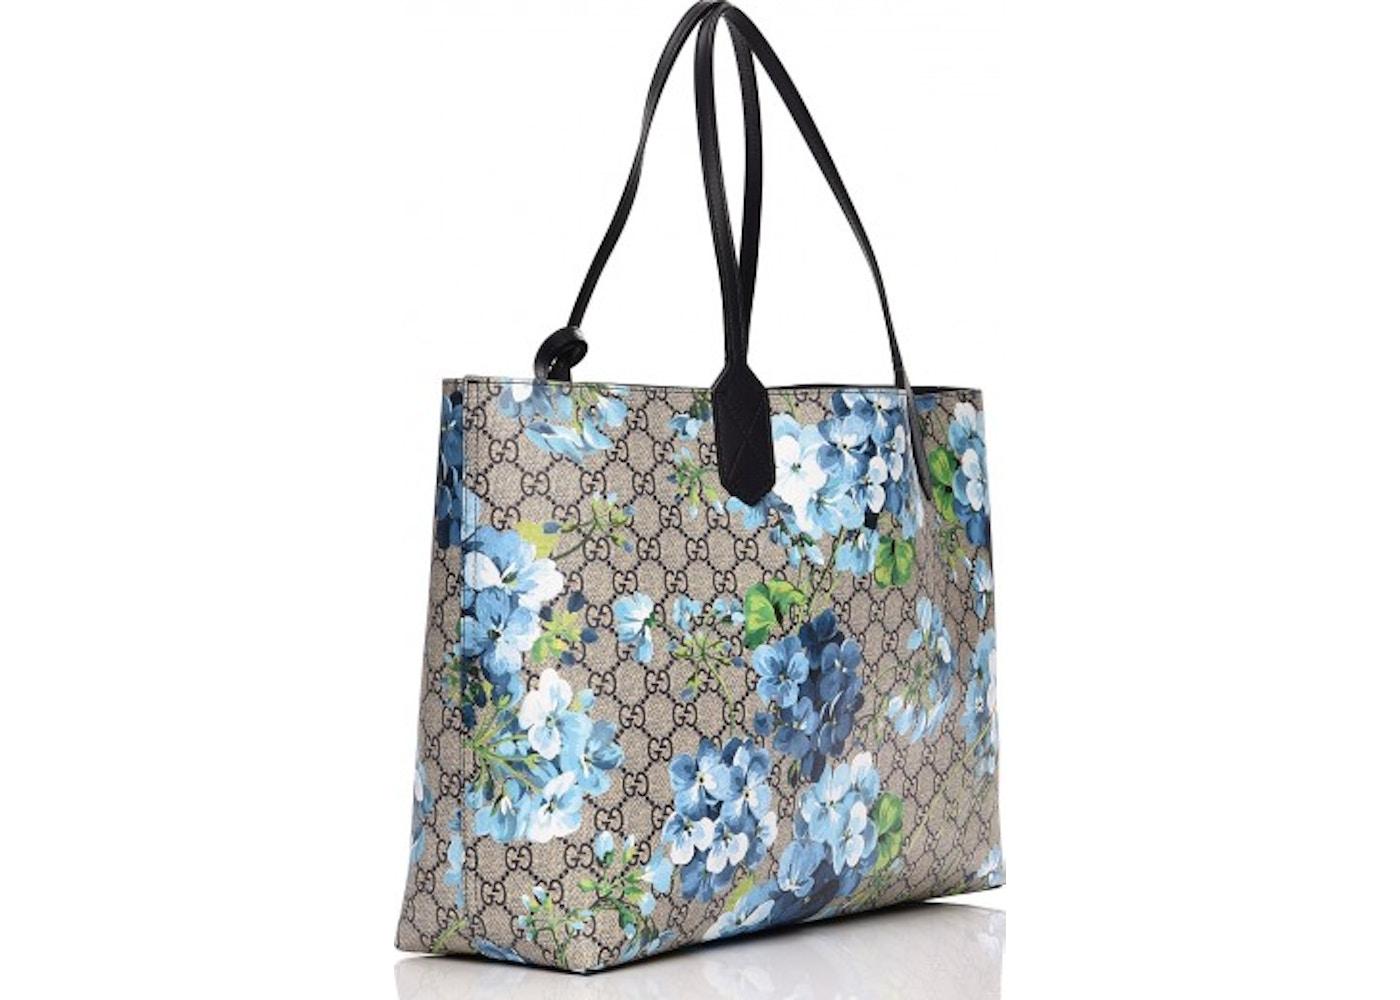 ee80272395f Gucci Reversible Tote Monogram GG Supreme Blooms Medium Beige Blue